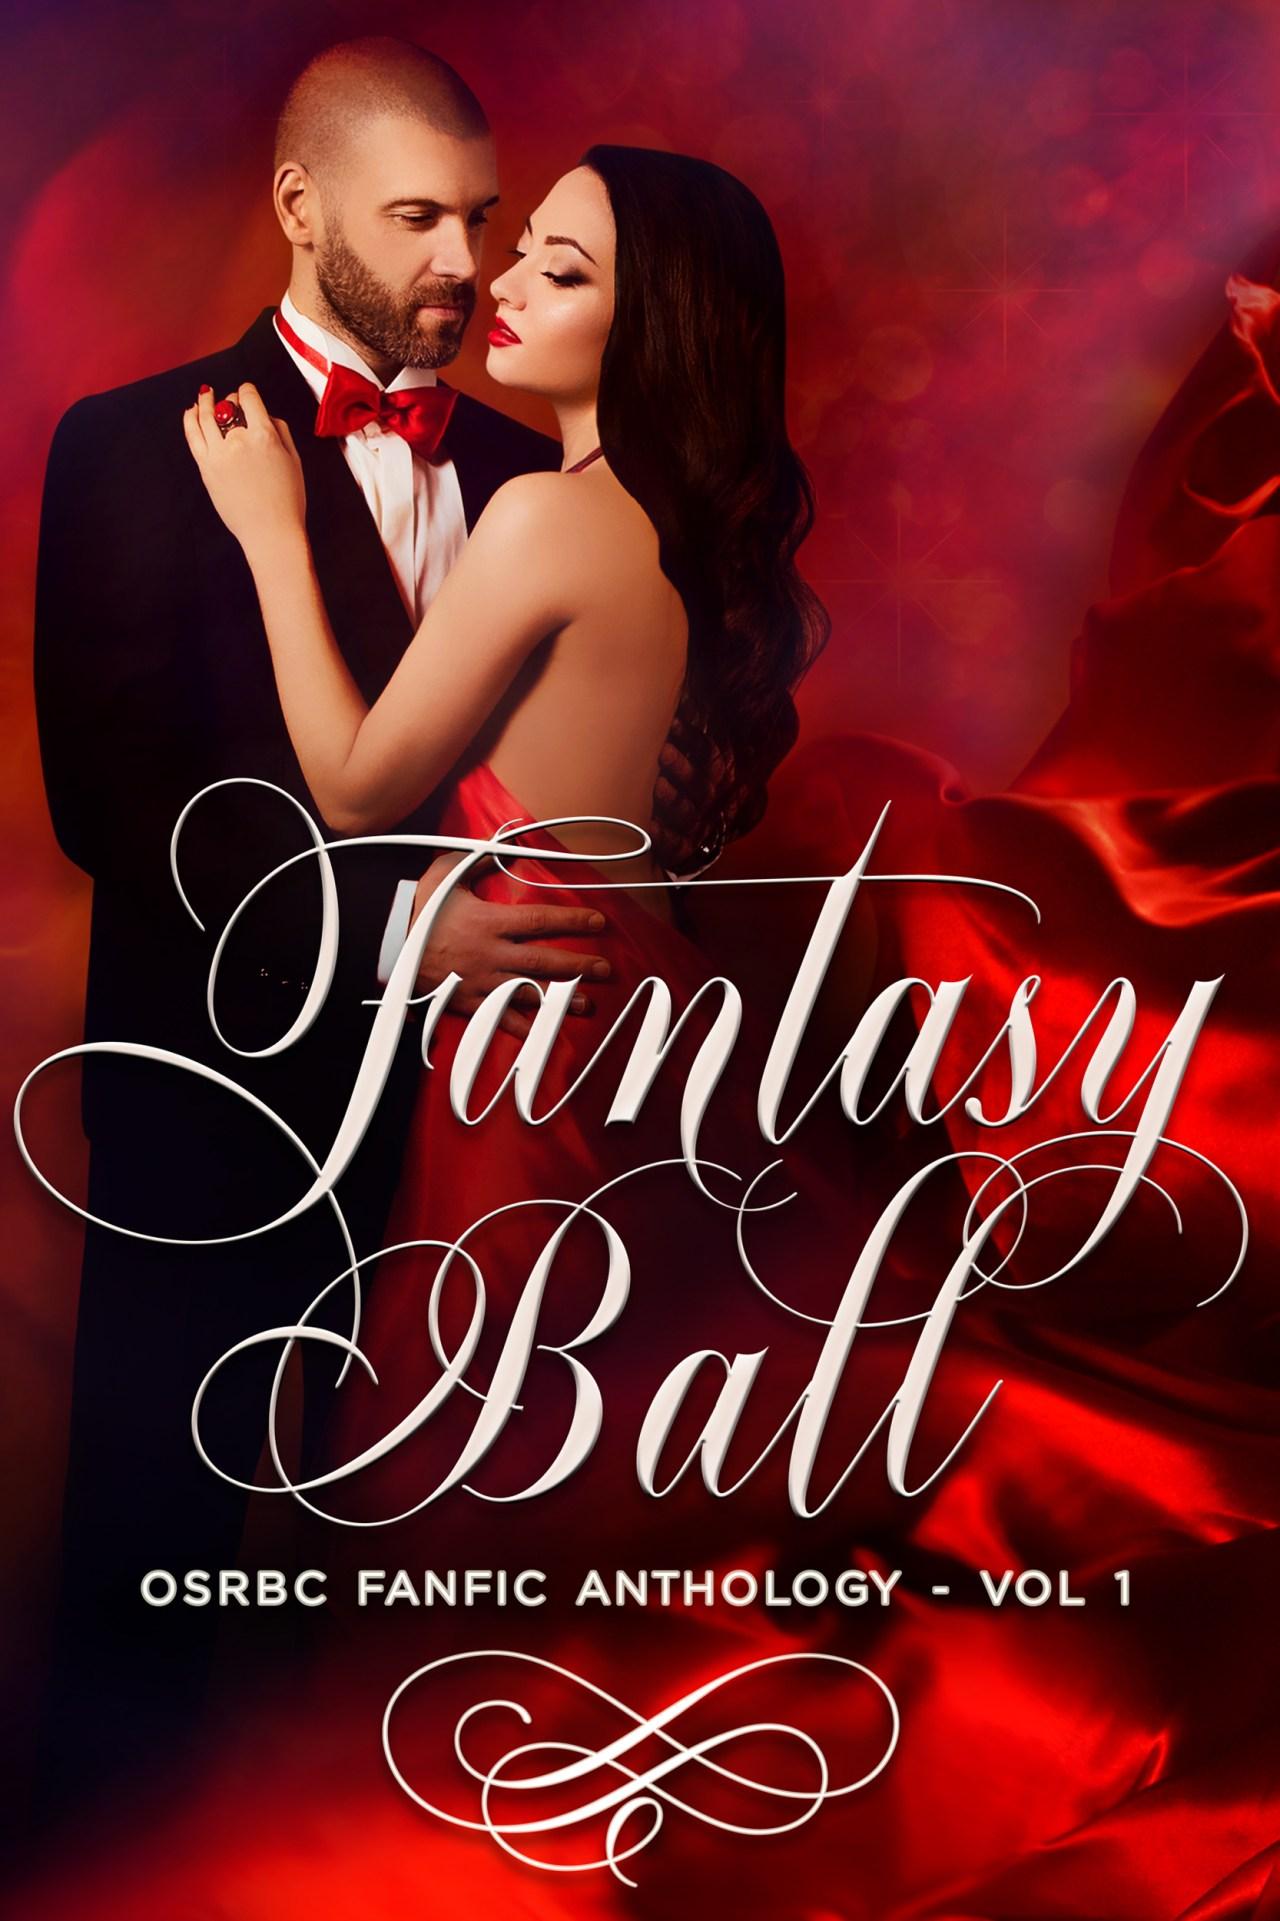 Fantasy Ball: OSRBC FanFic Anthology Vol 1 | Cover Design by Render Compose